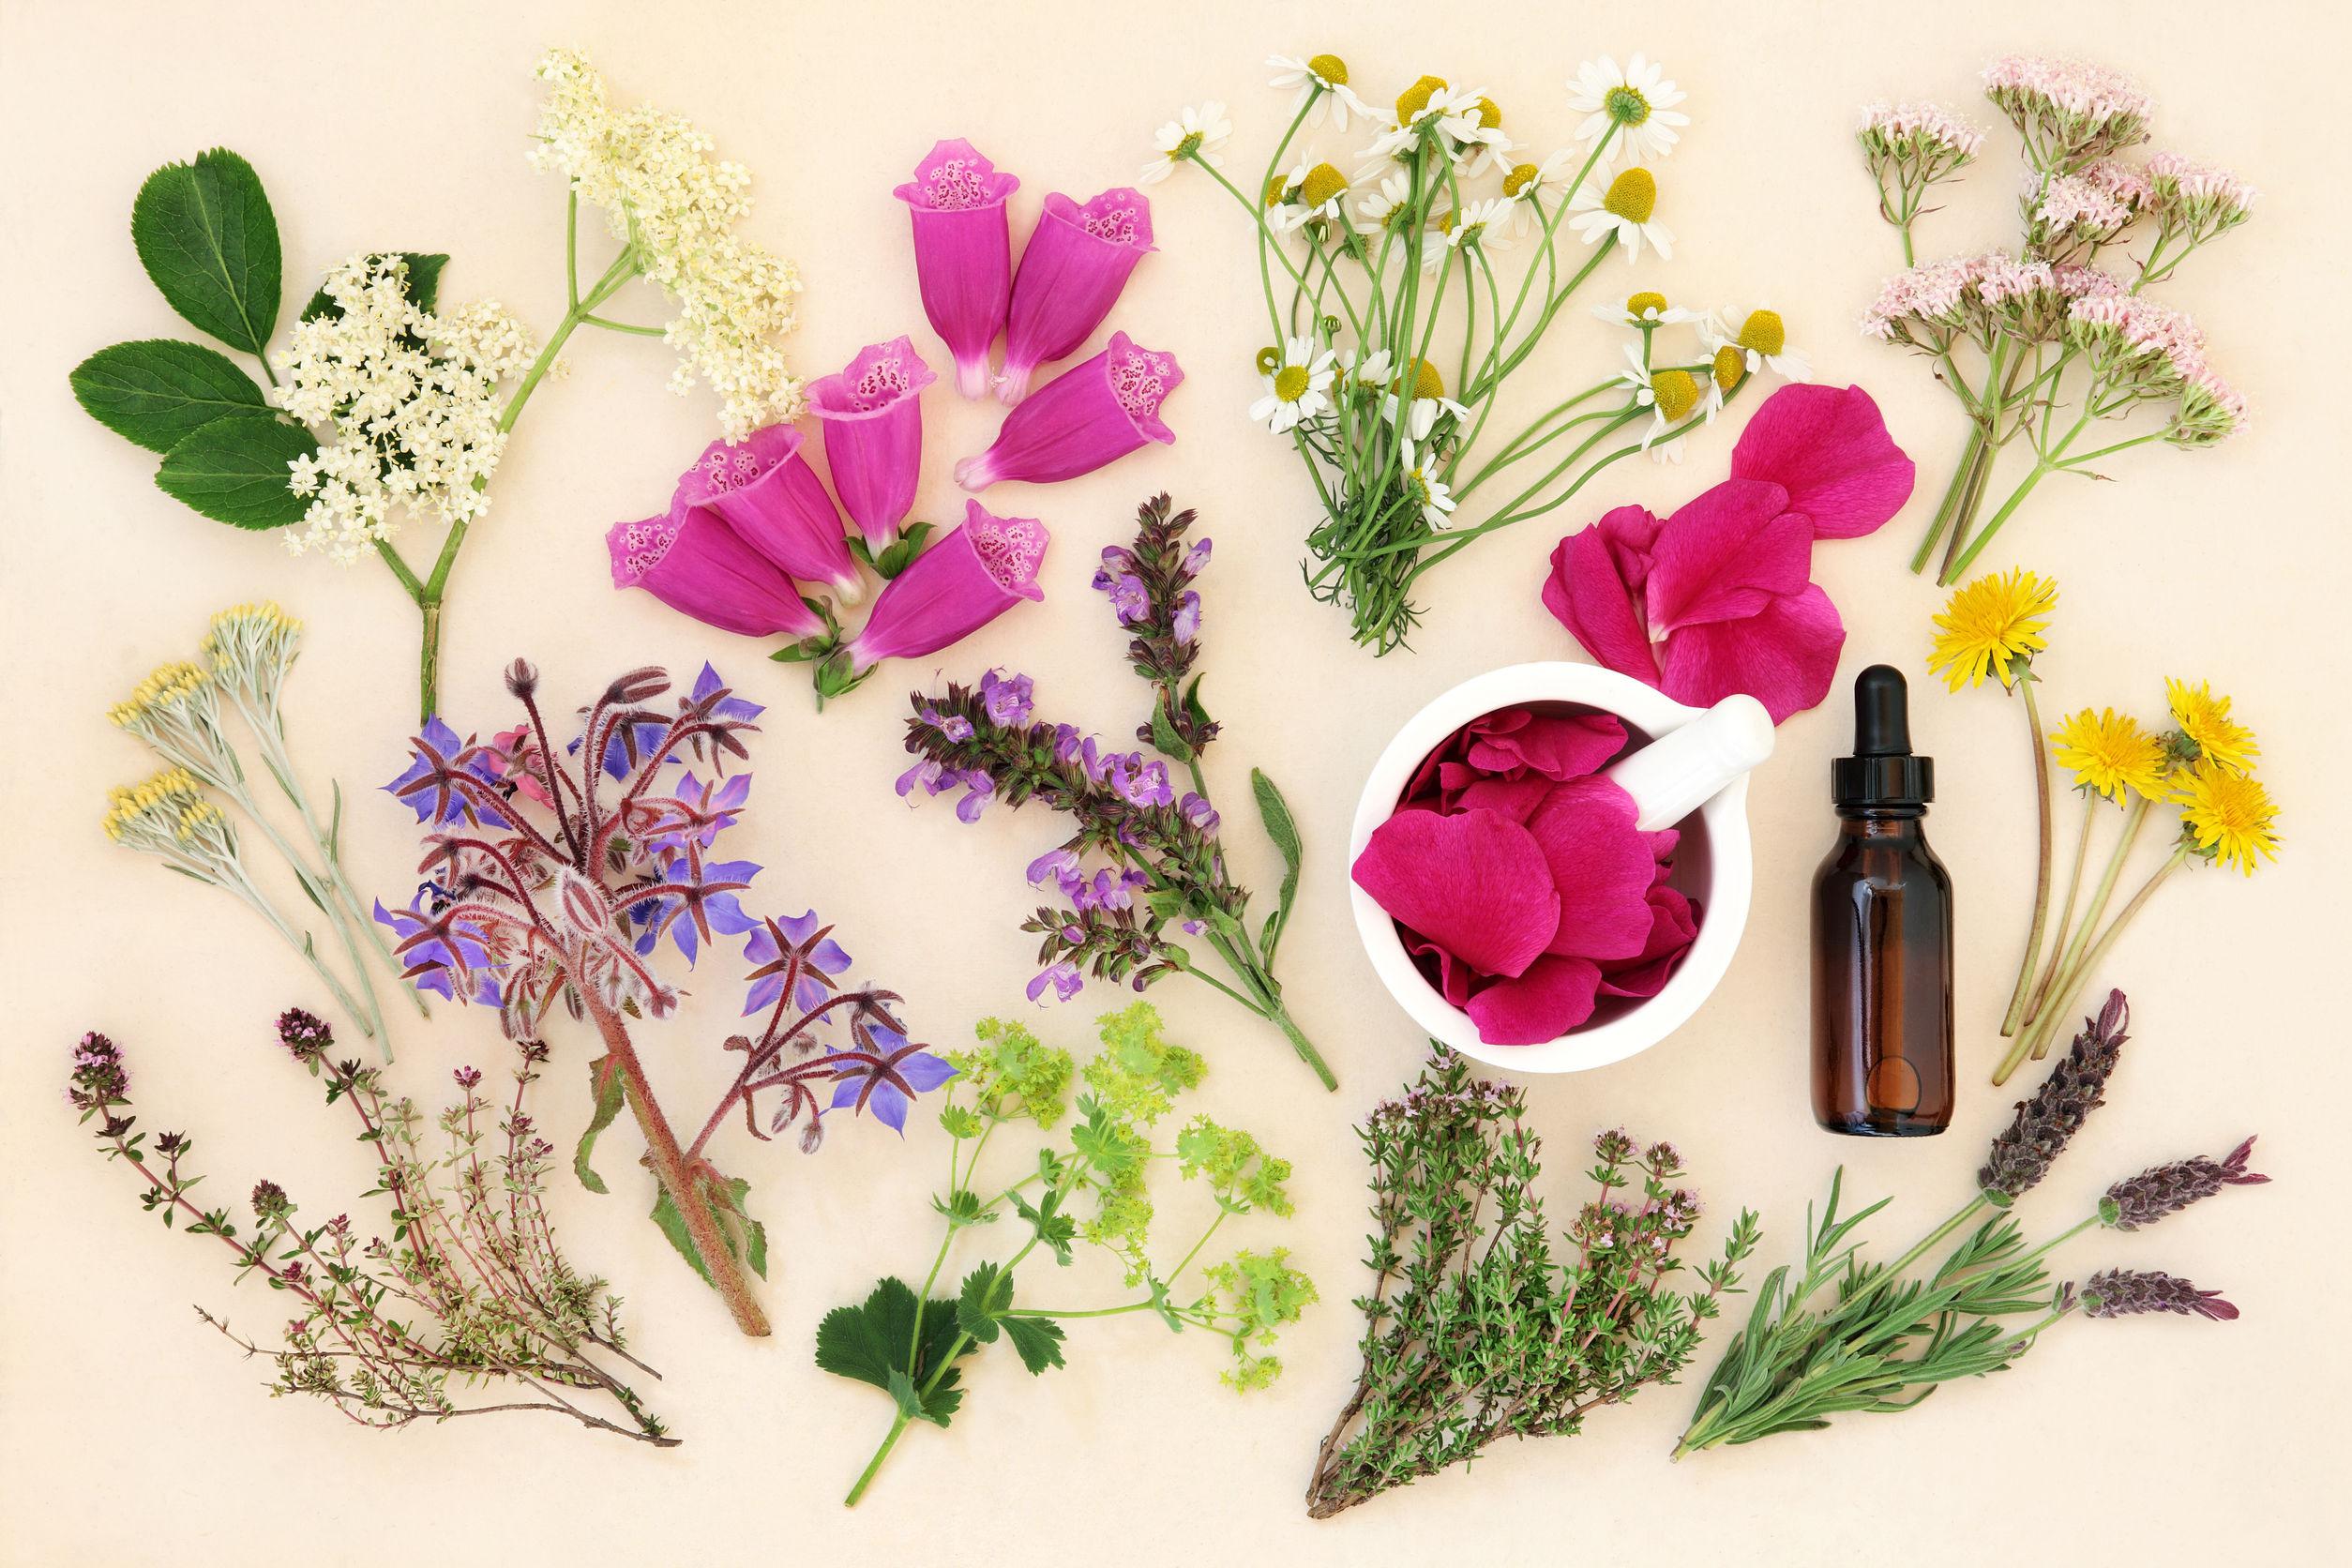 Healing through Power of Nature